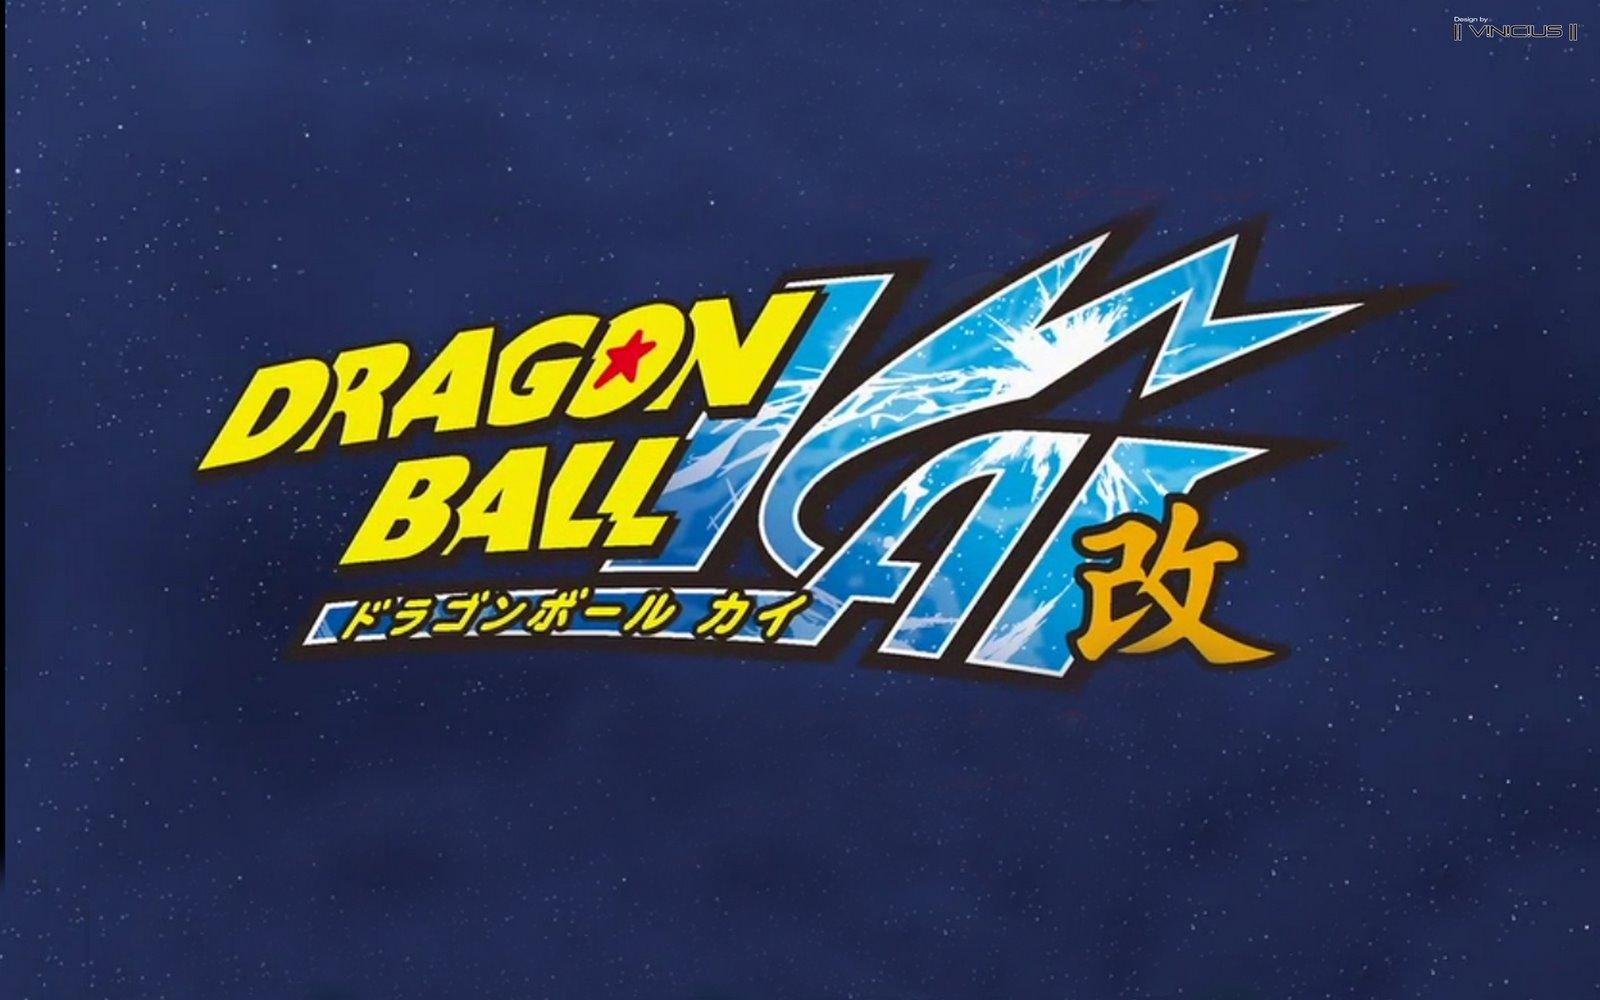 http://1.bp.blogspot.com/_5klvajDieZ8/TMoHB015LrI/AAAAAAAAARI/_kh5U43pZIs/s1600/wallpaper_widescreen_-_dragon_ball_kai.jpg